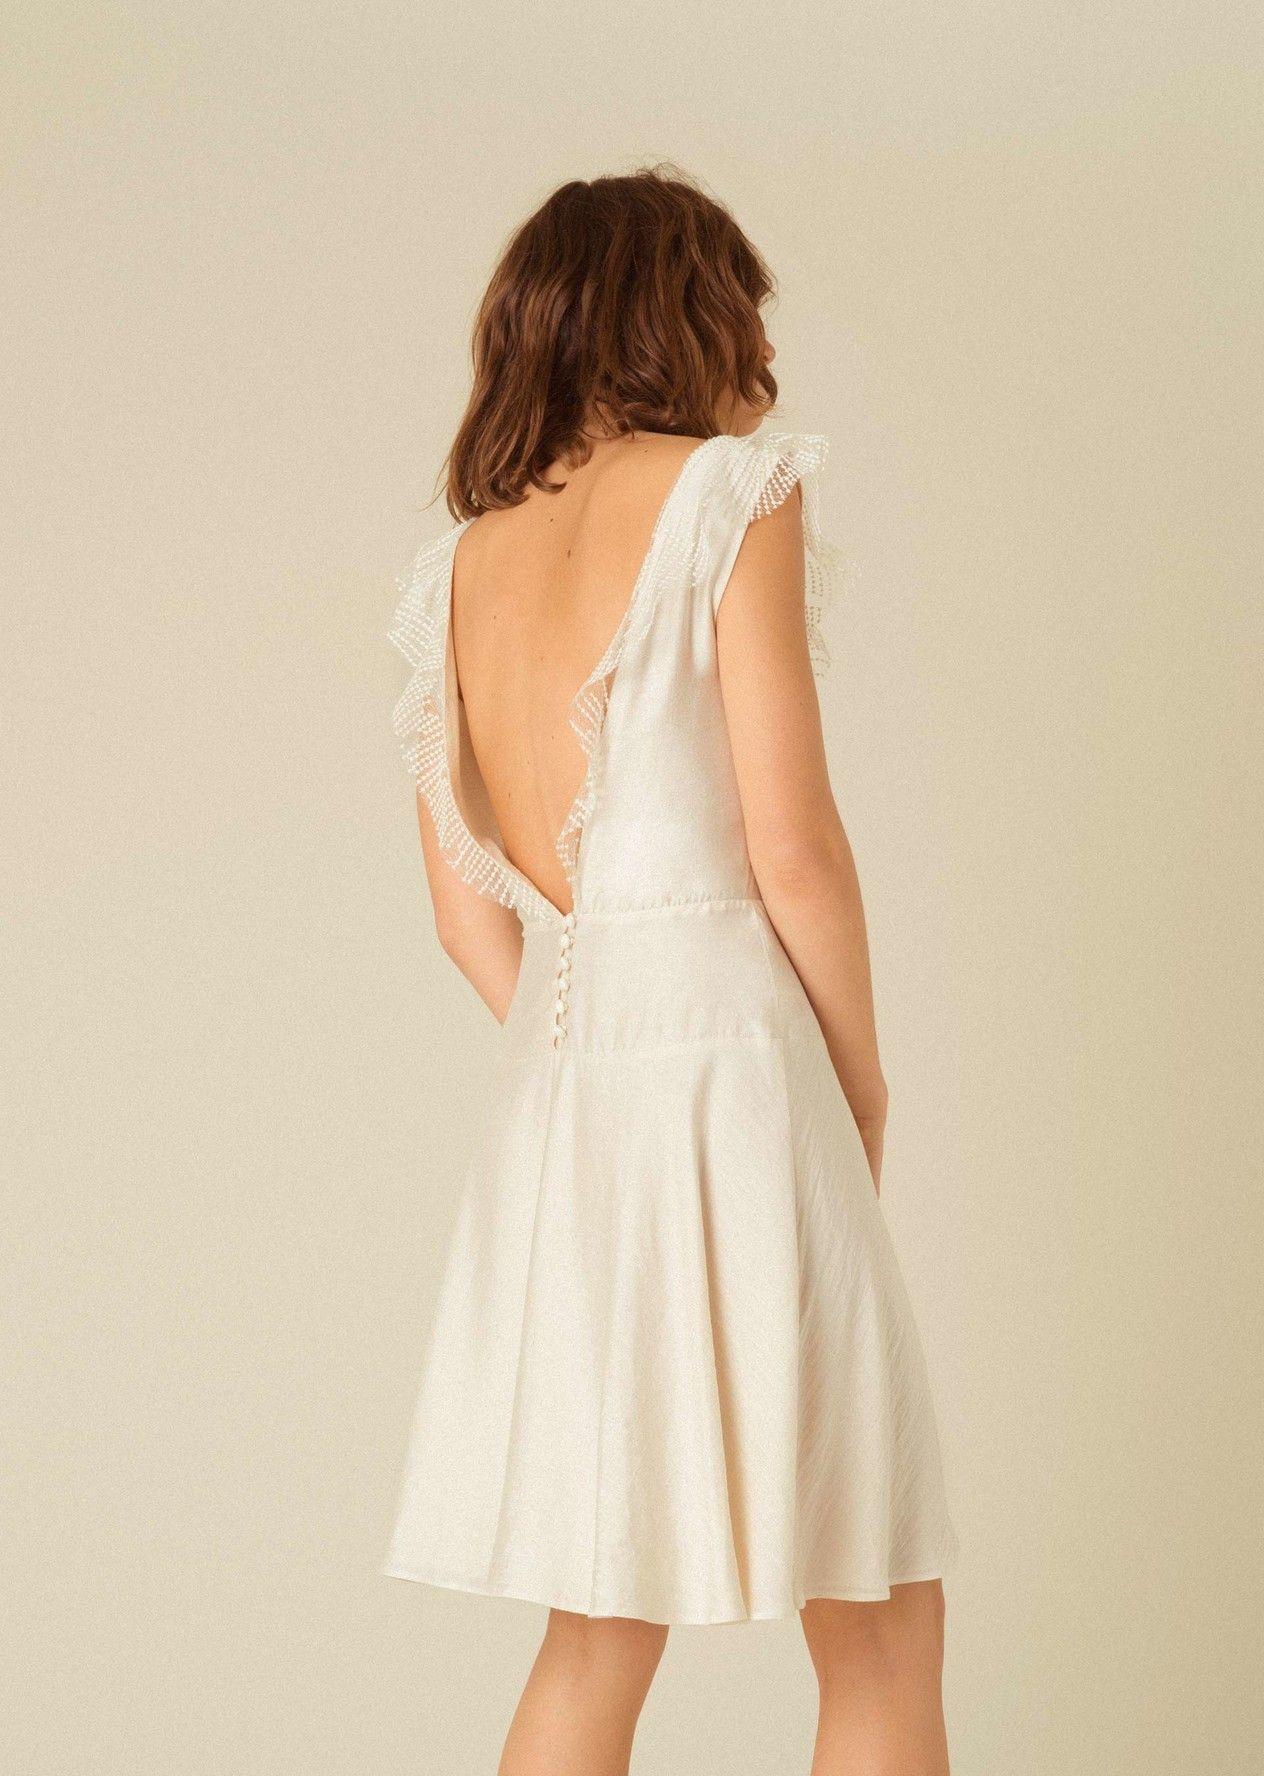 sessun-oui-amorito18  Mode inspiration, Hochzeitskleid, Kleider